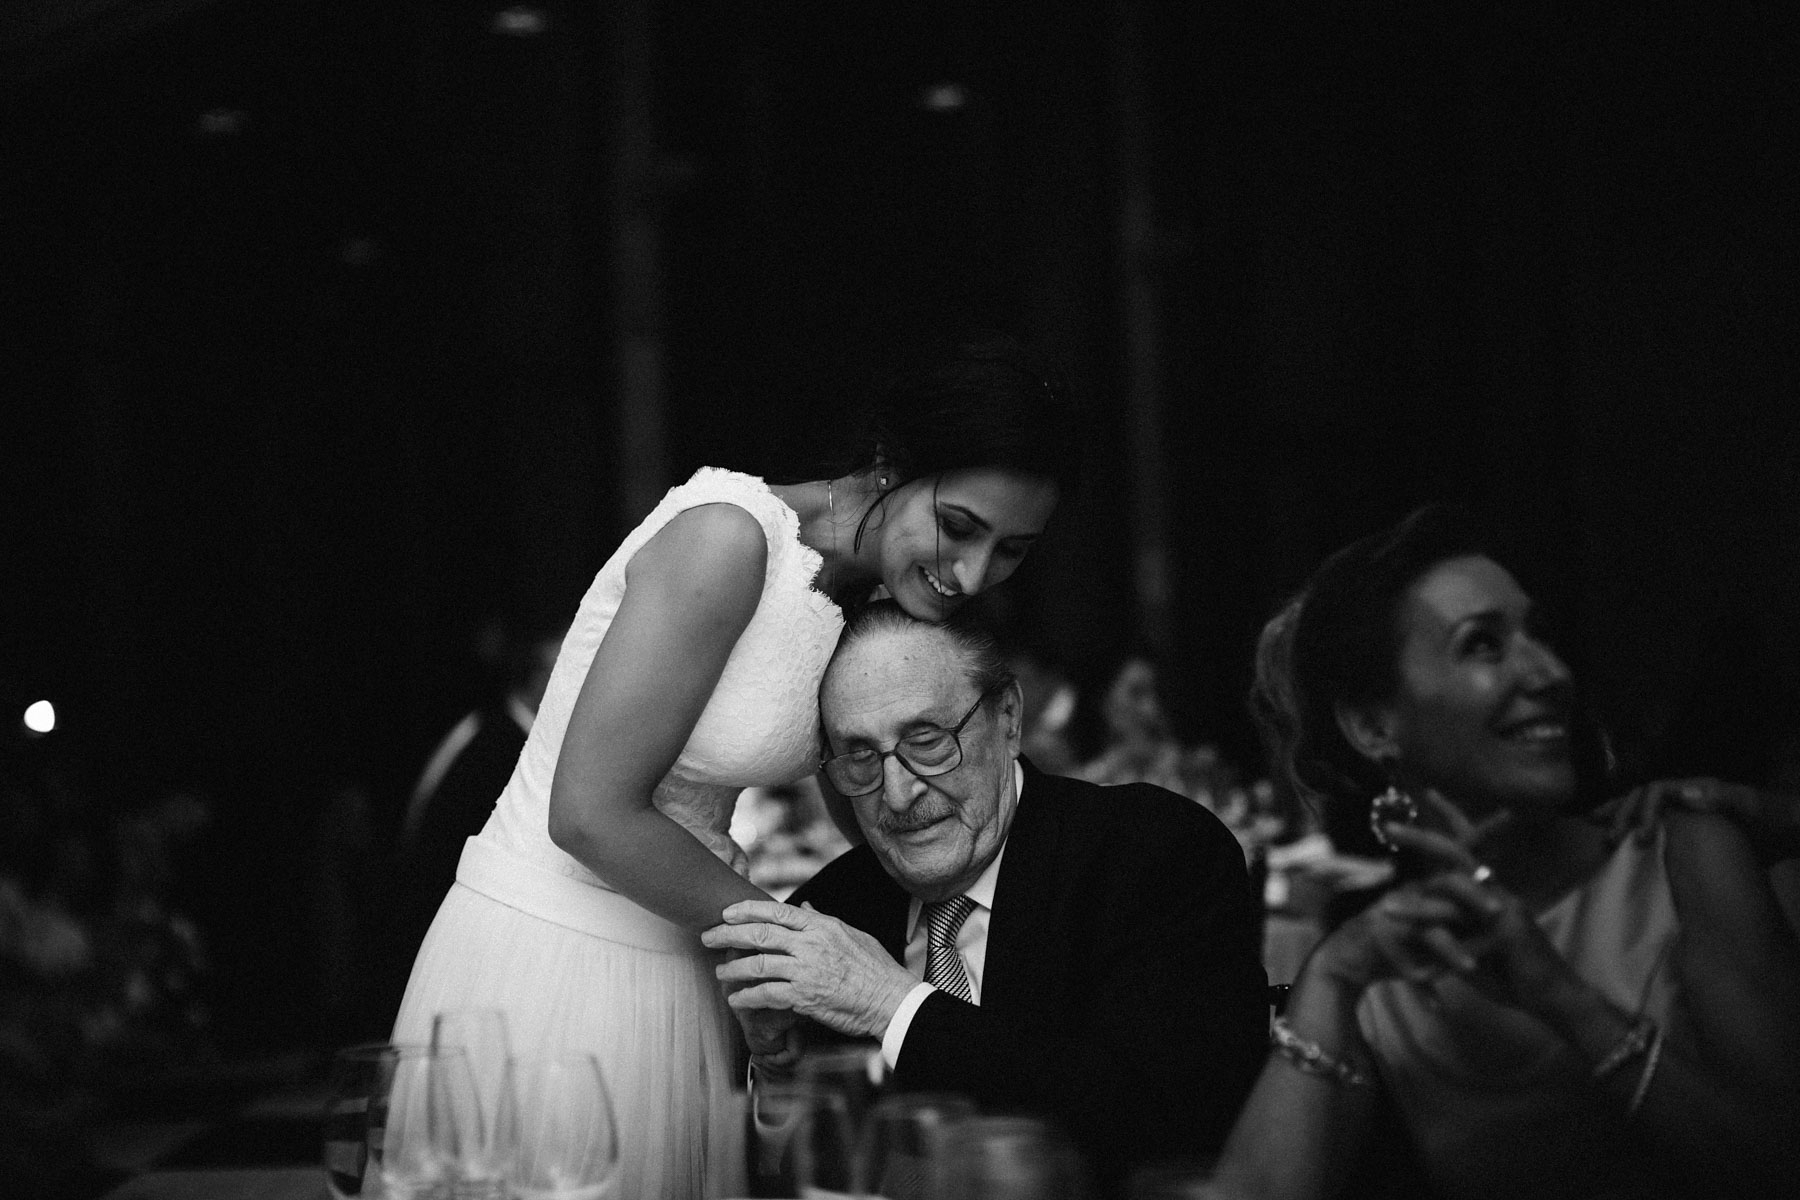 fotografo de bodas Jairo Crena-51